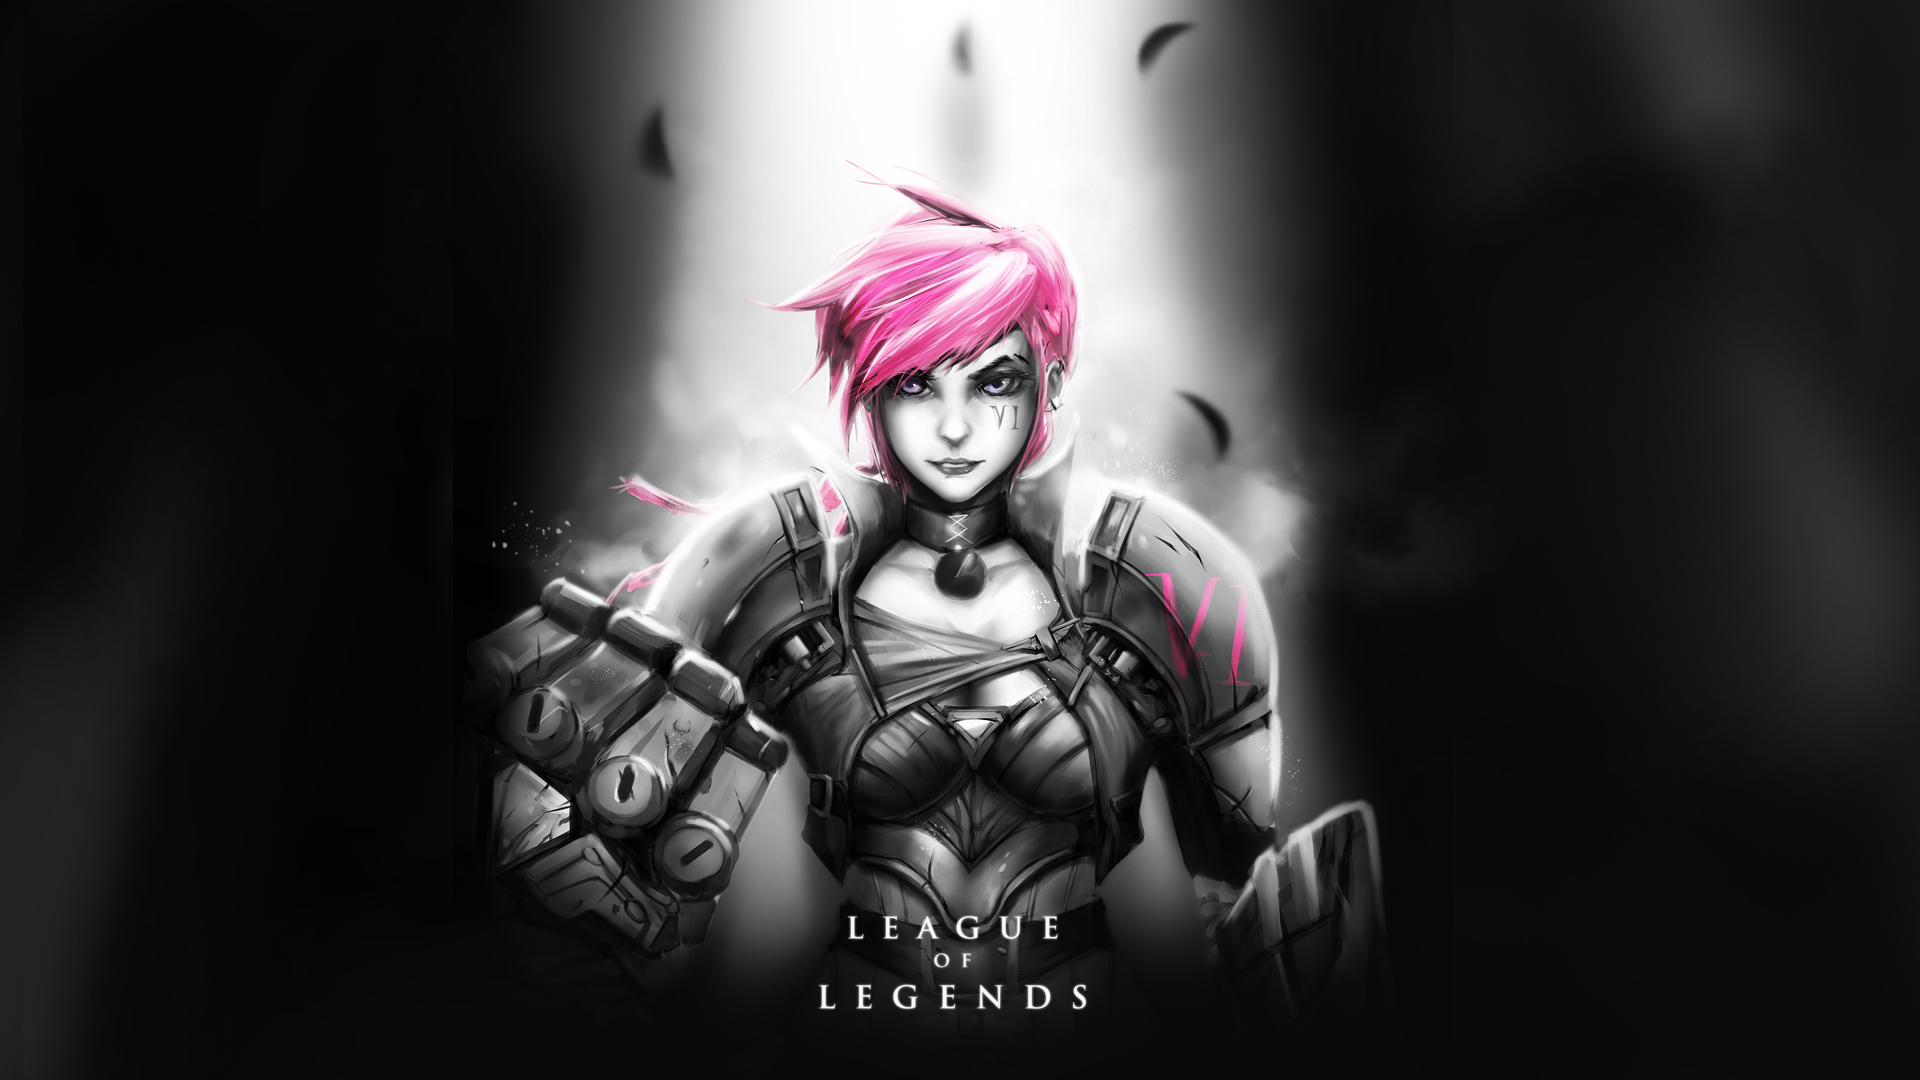 League of Legends wallpaper 100